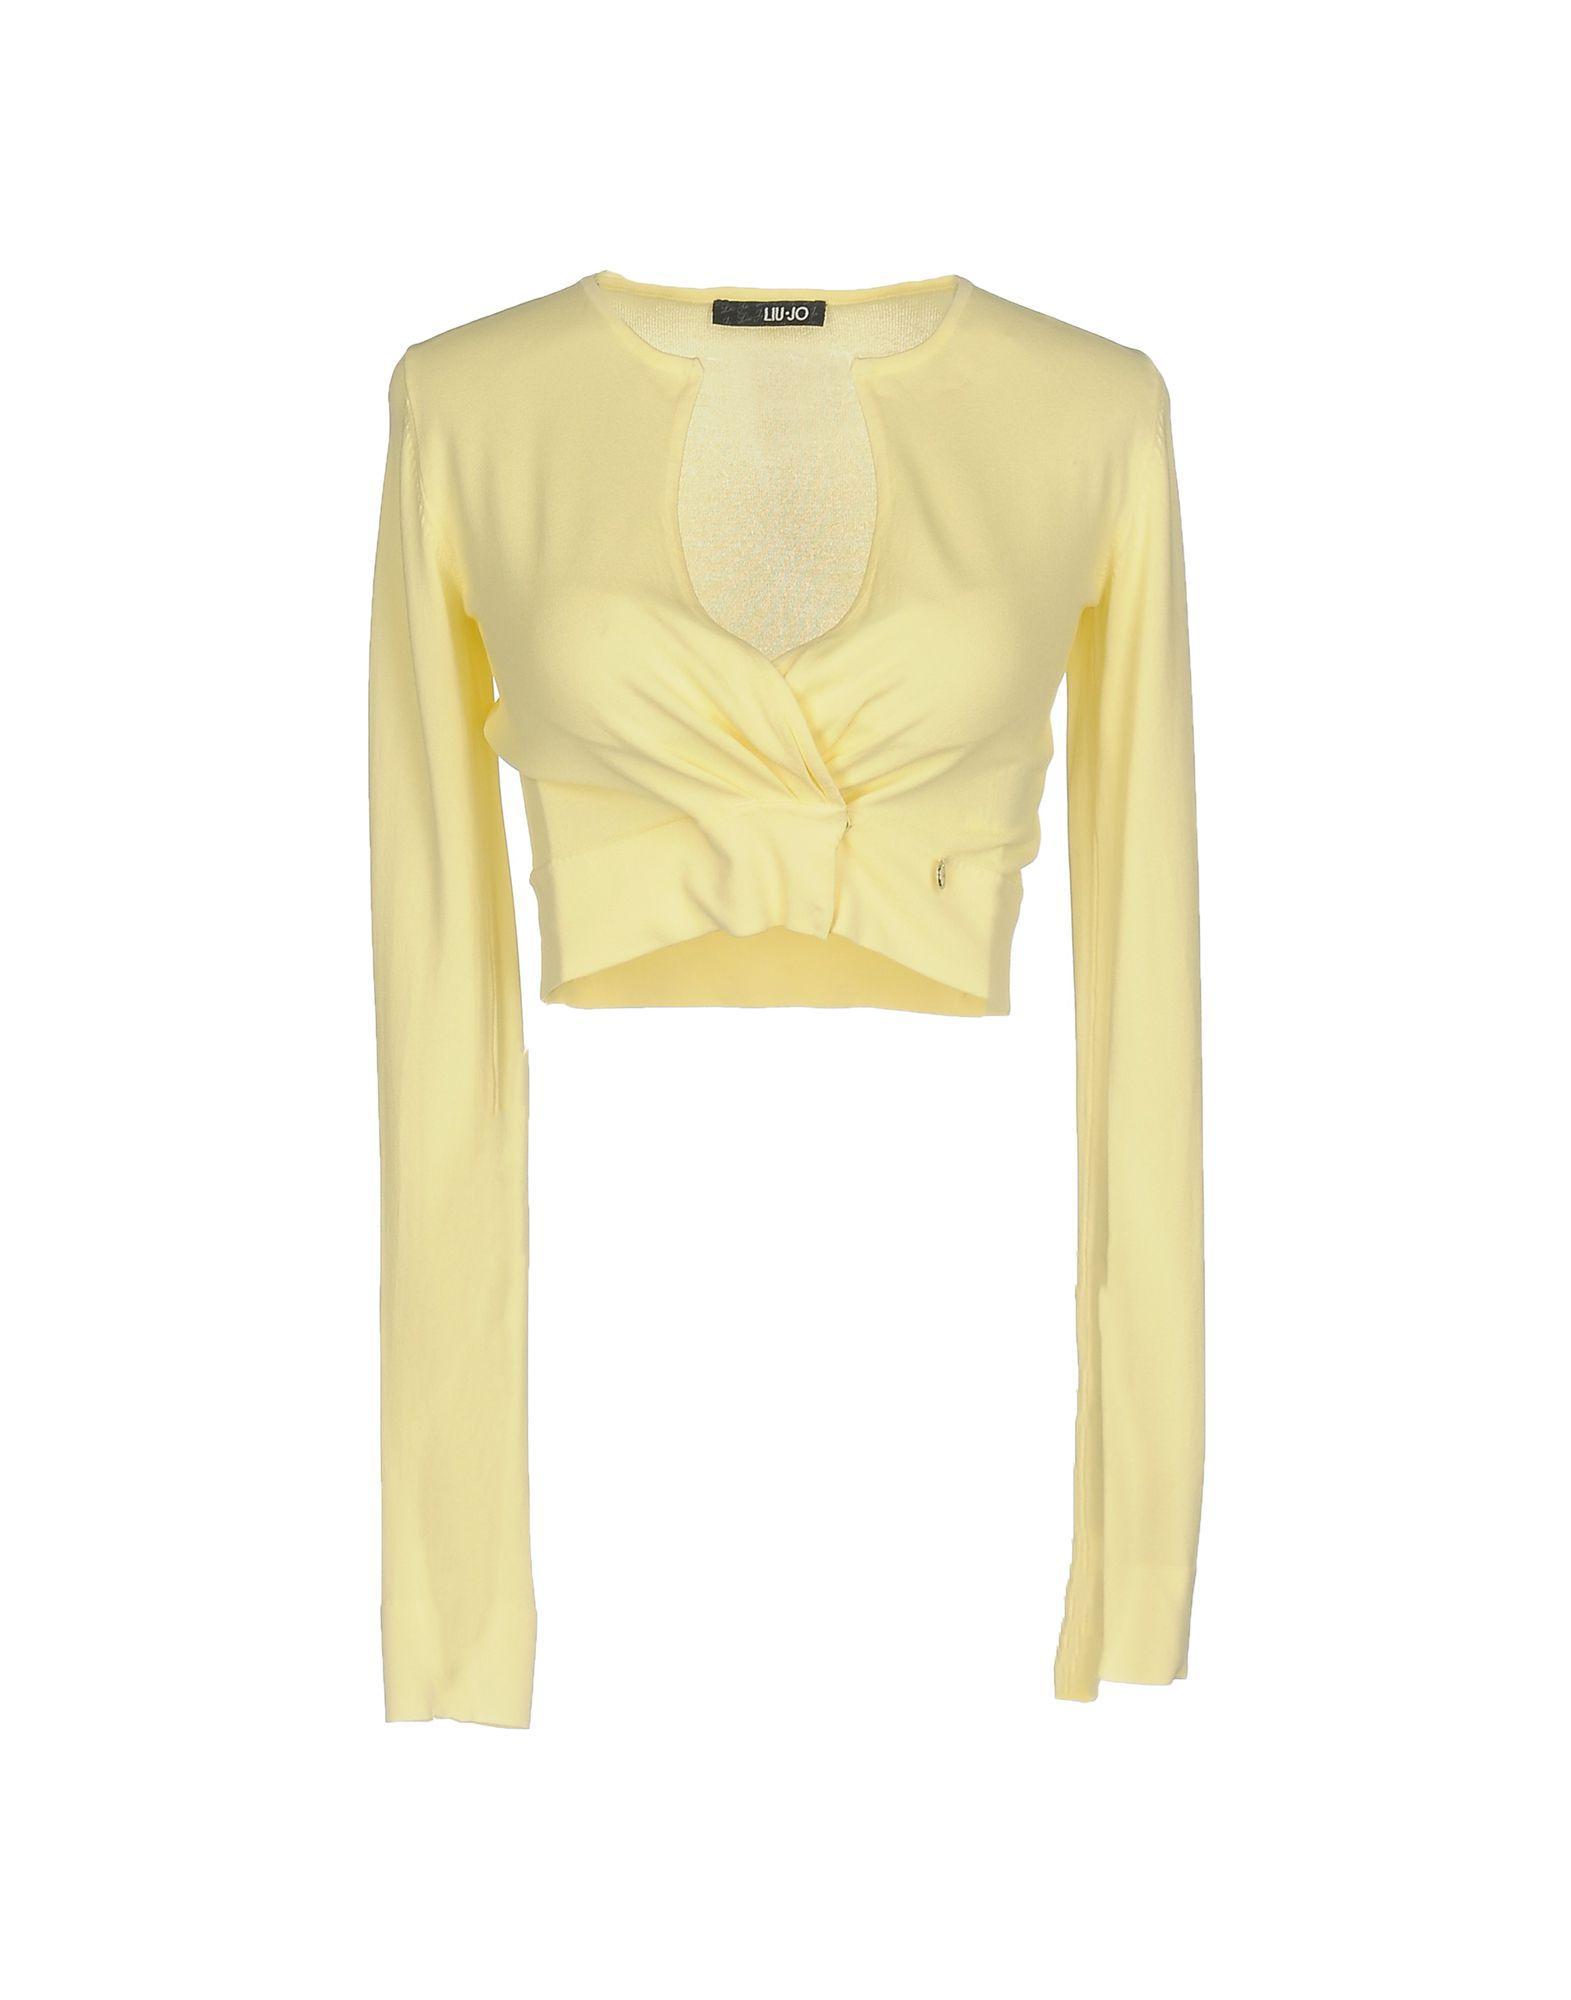 Liu •jo Shrug In Light Yellow